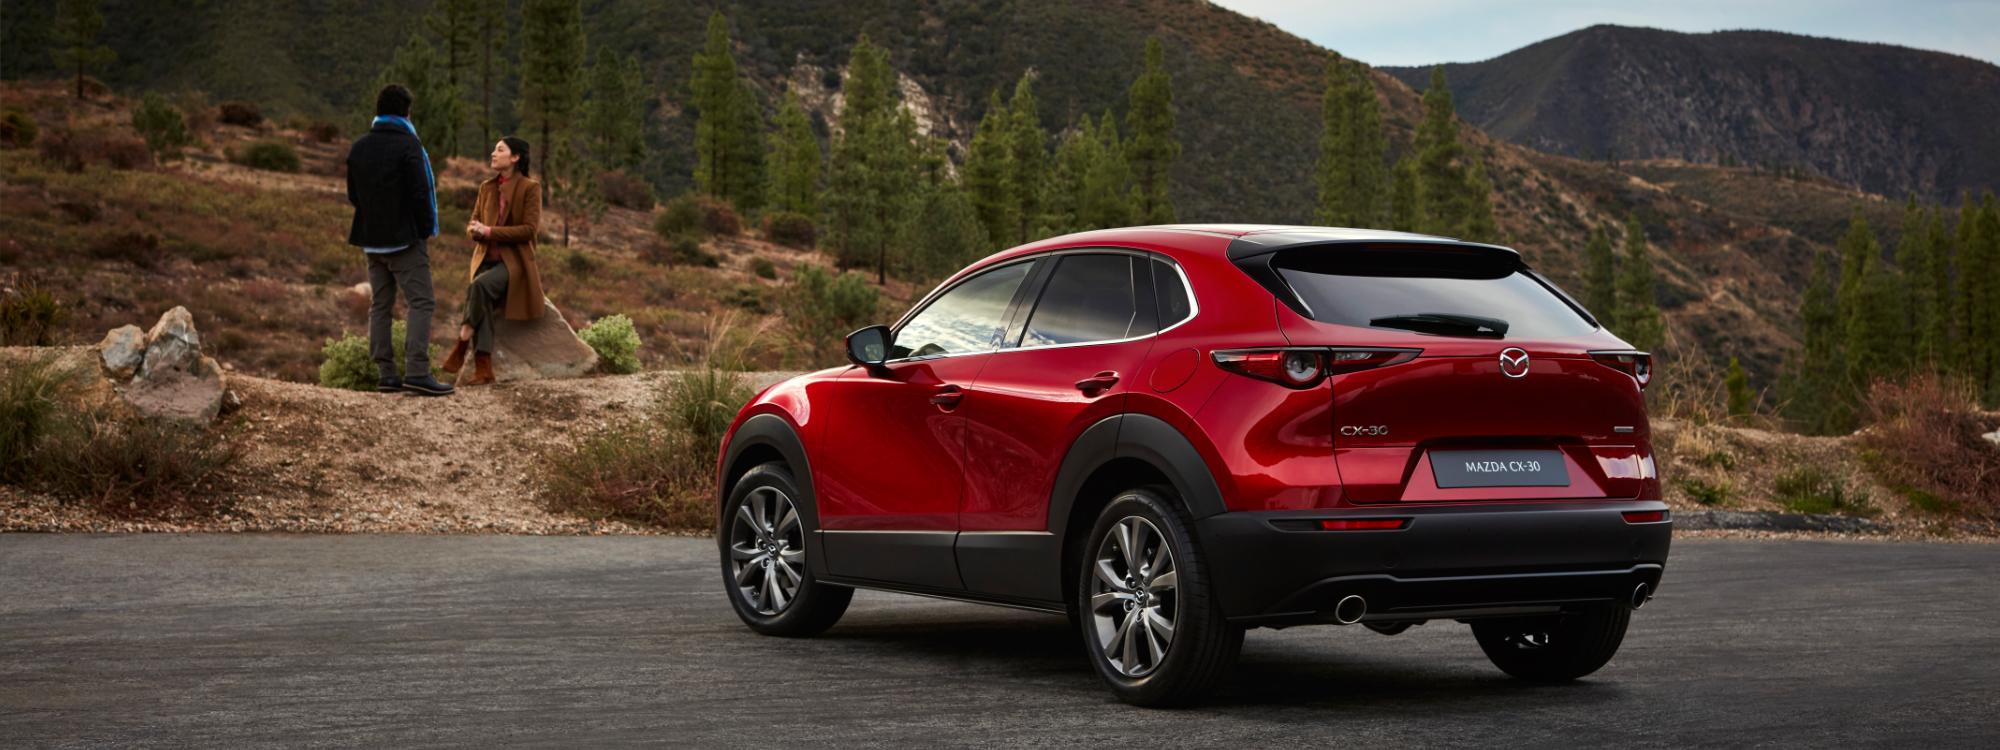 Mazda CX-30 in nature